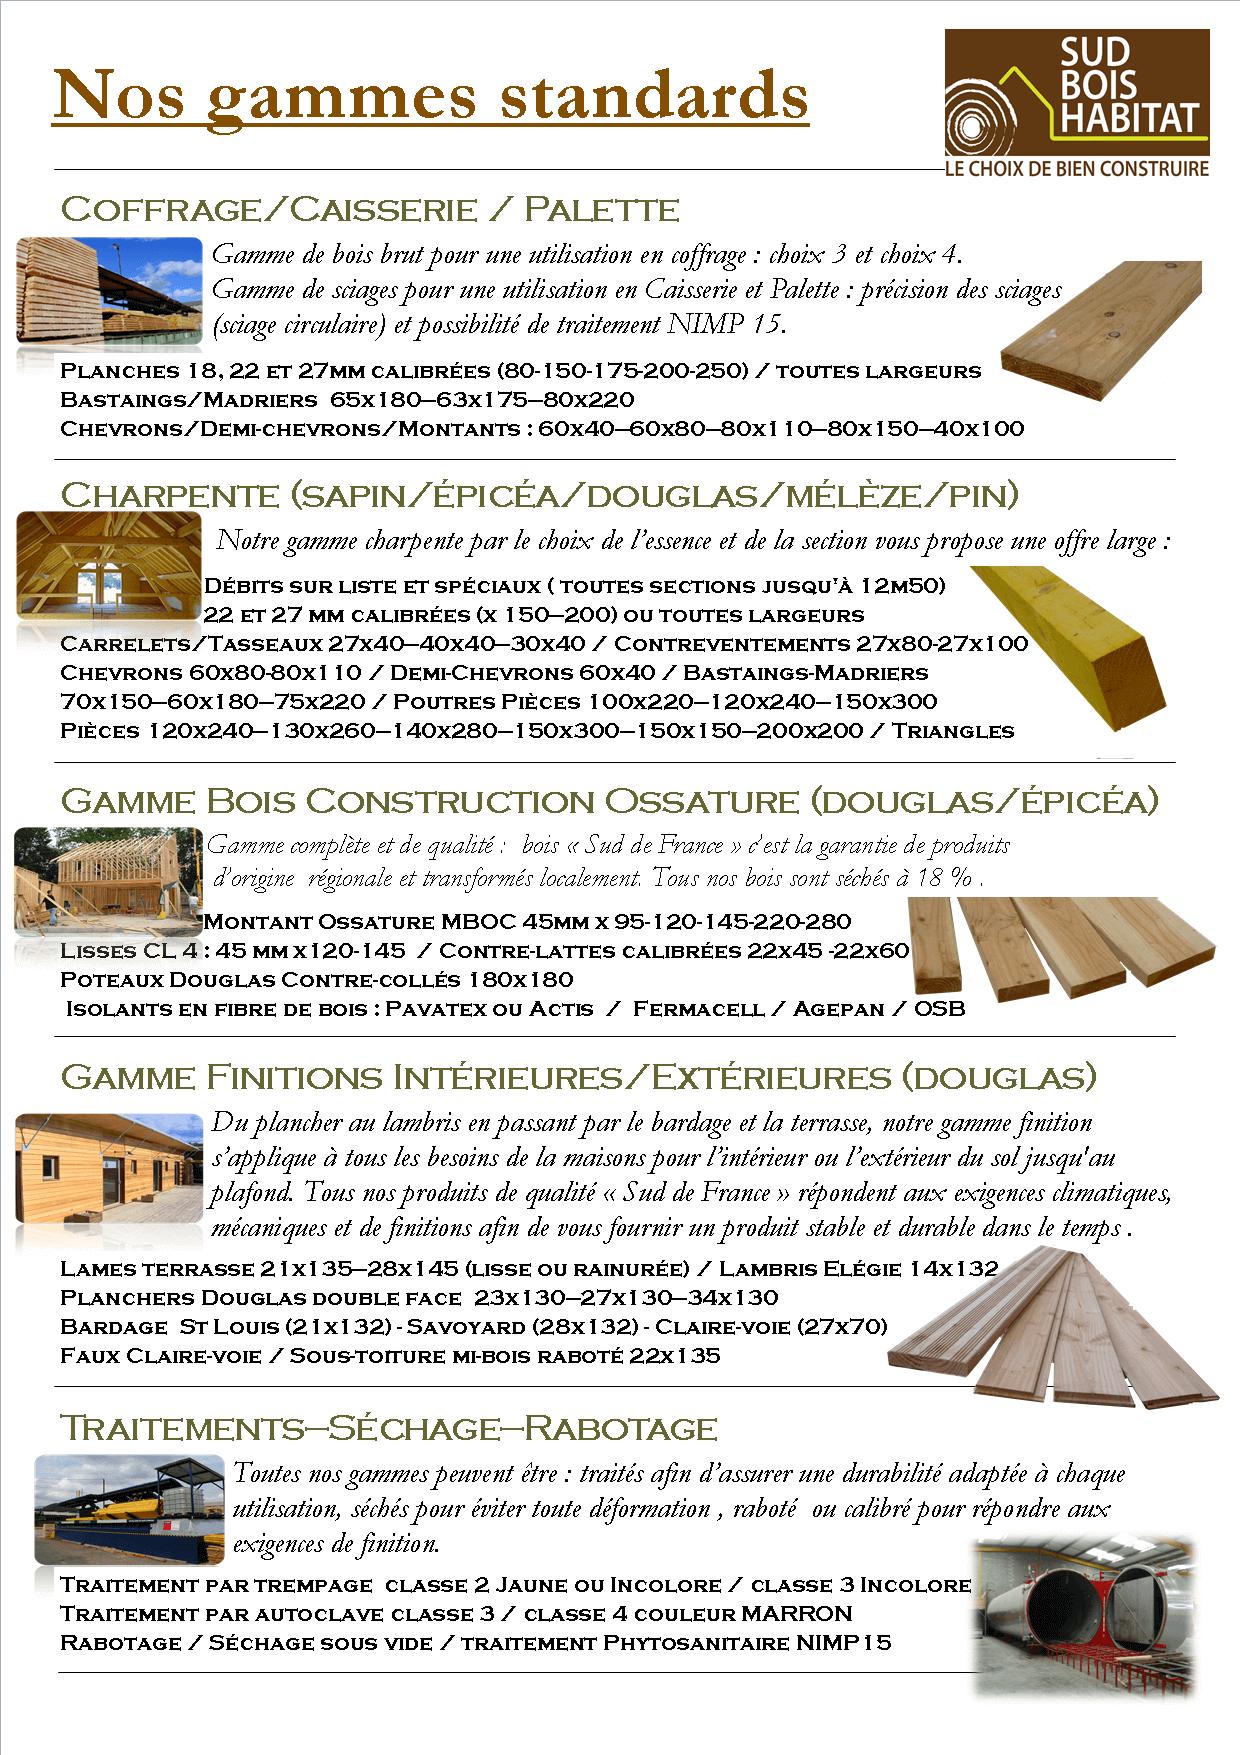 Nos produits bois